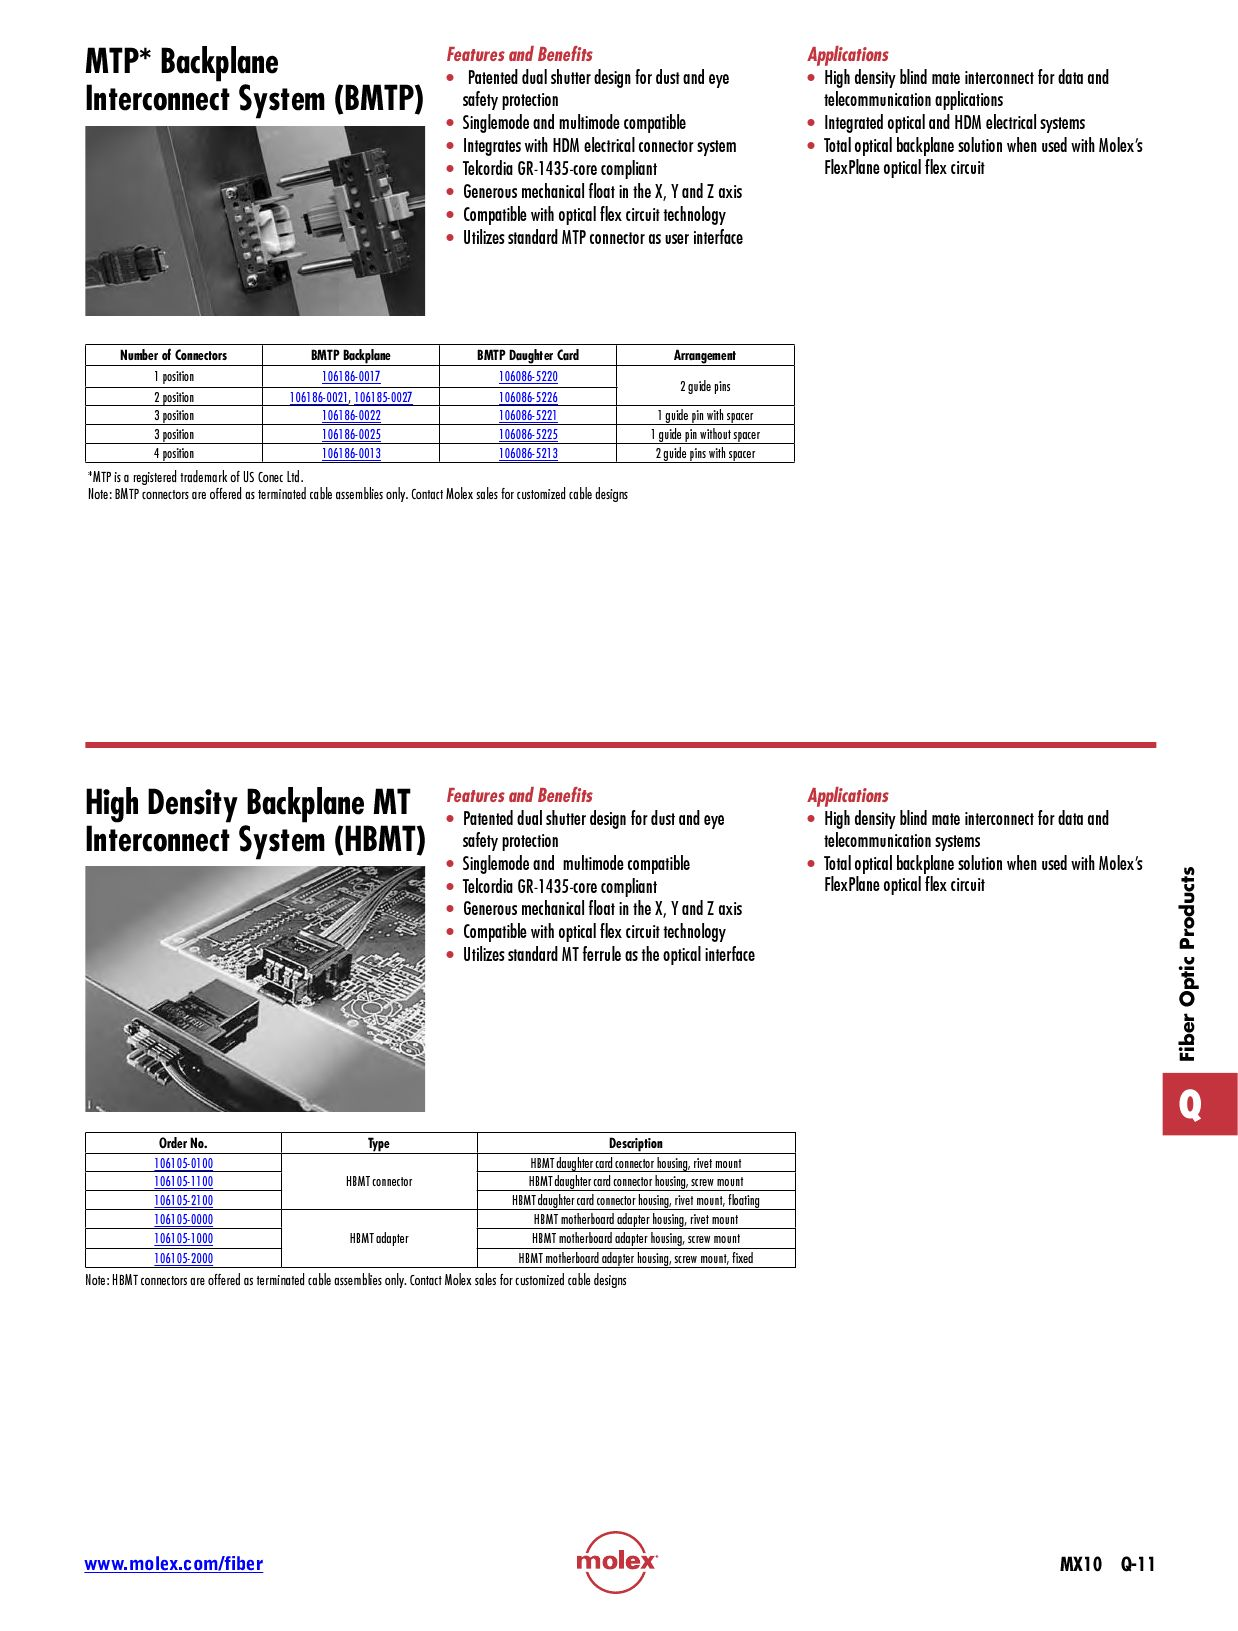 Molex Mx10 Catalog Section Q Fiber Optic Products By Issuu Optics Integrated Circuits Images Buy